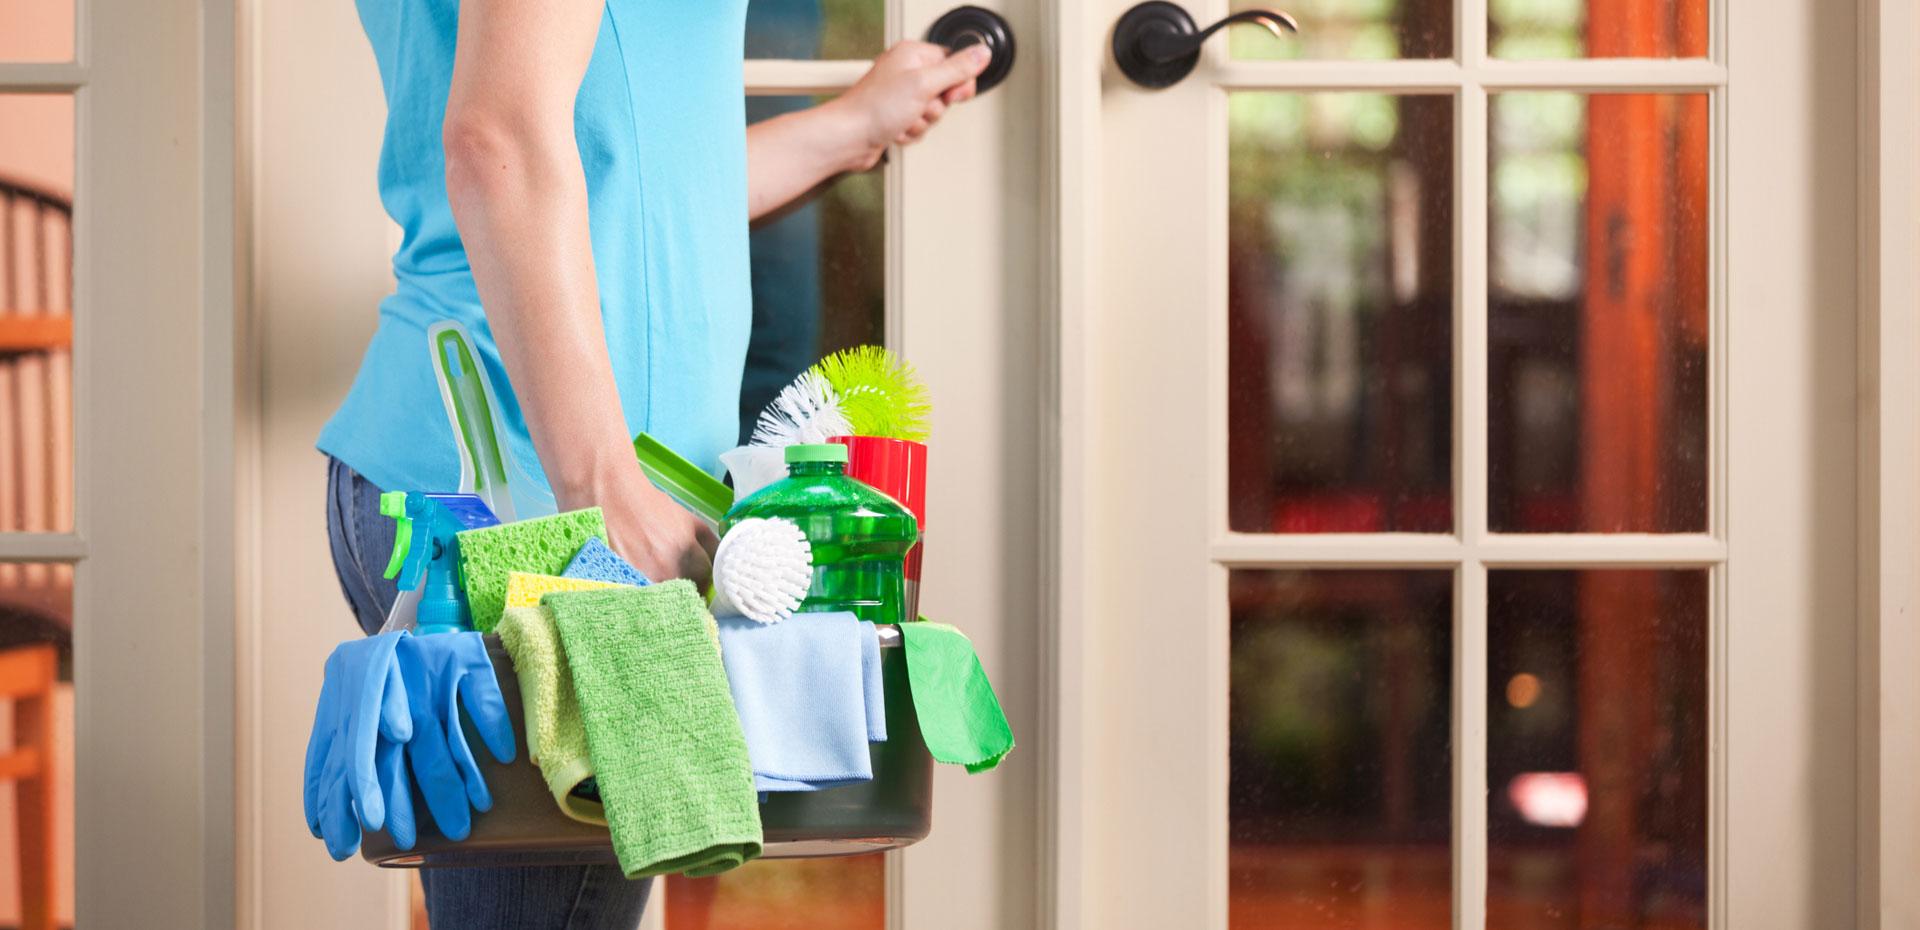 housework-service